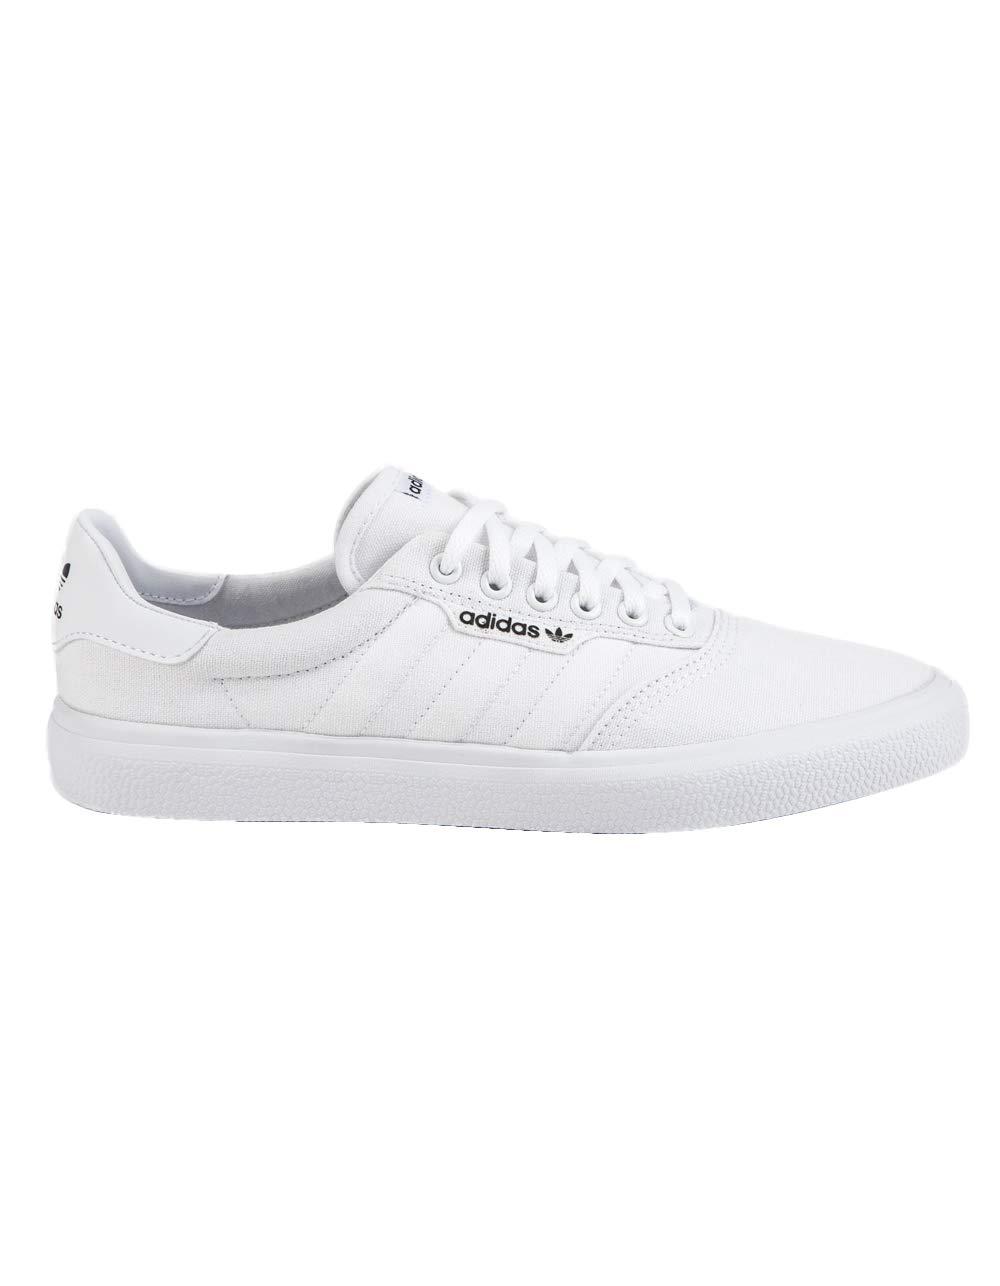 online store a8831 51ee3 Galleon - Adidas Originals 3 MC Skate Shoe WhiteGold Metallic, 10 M US